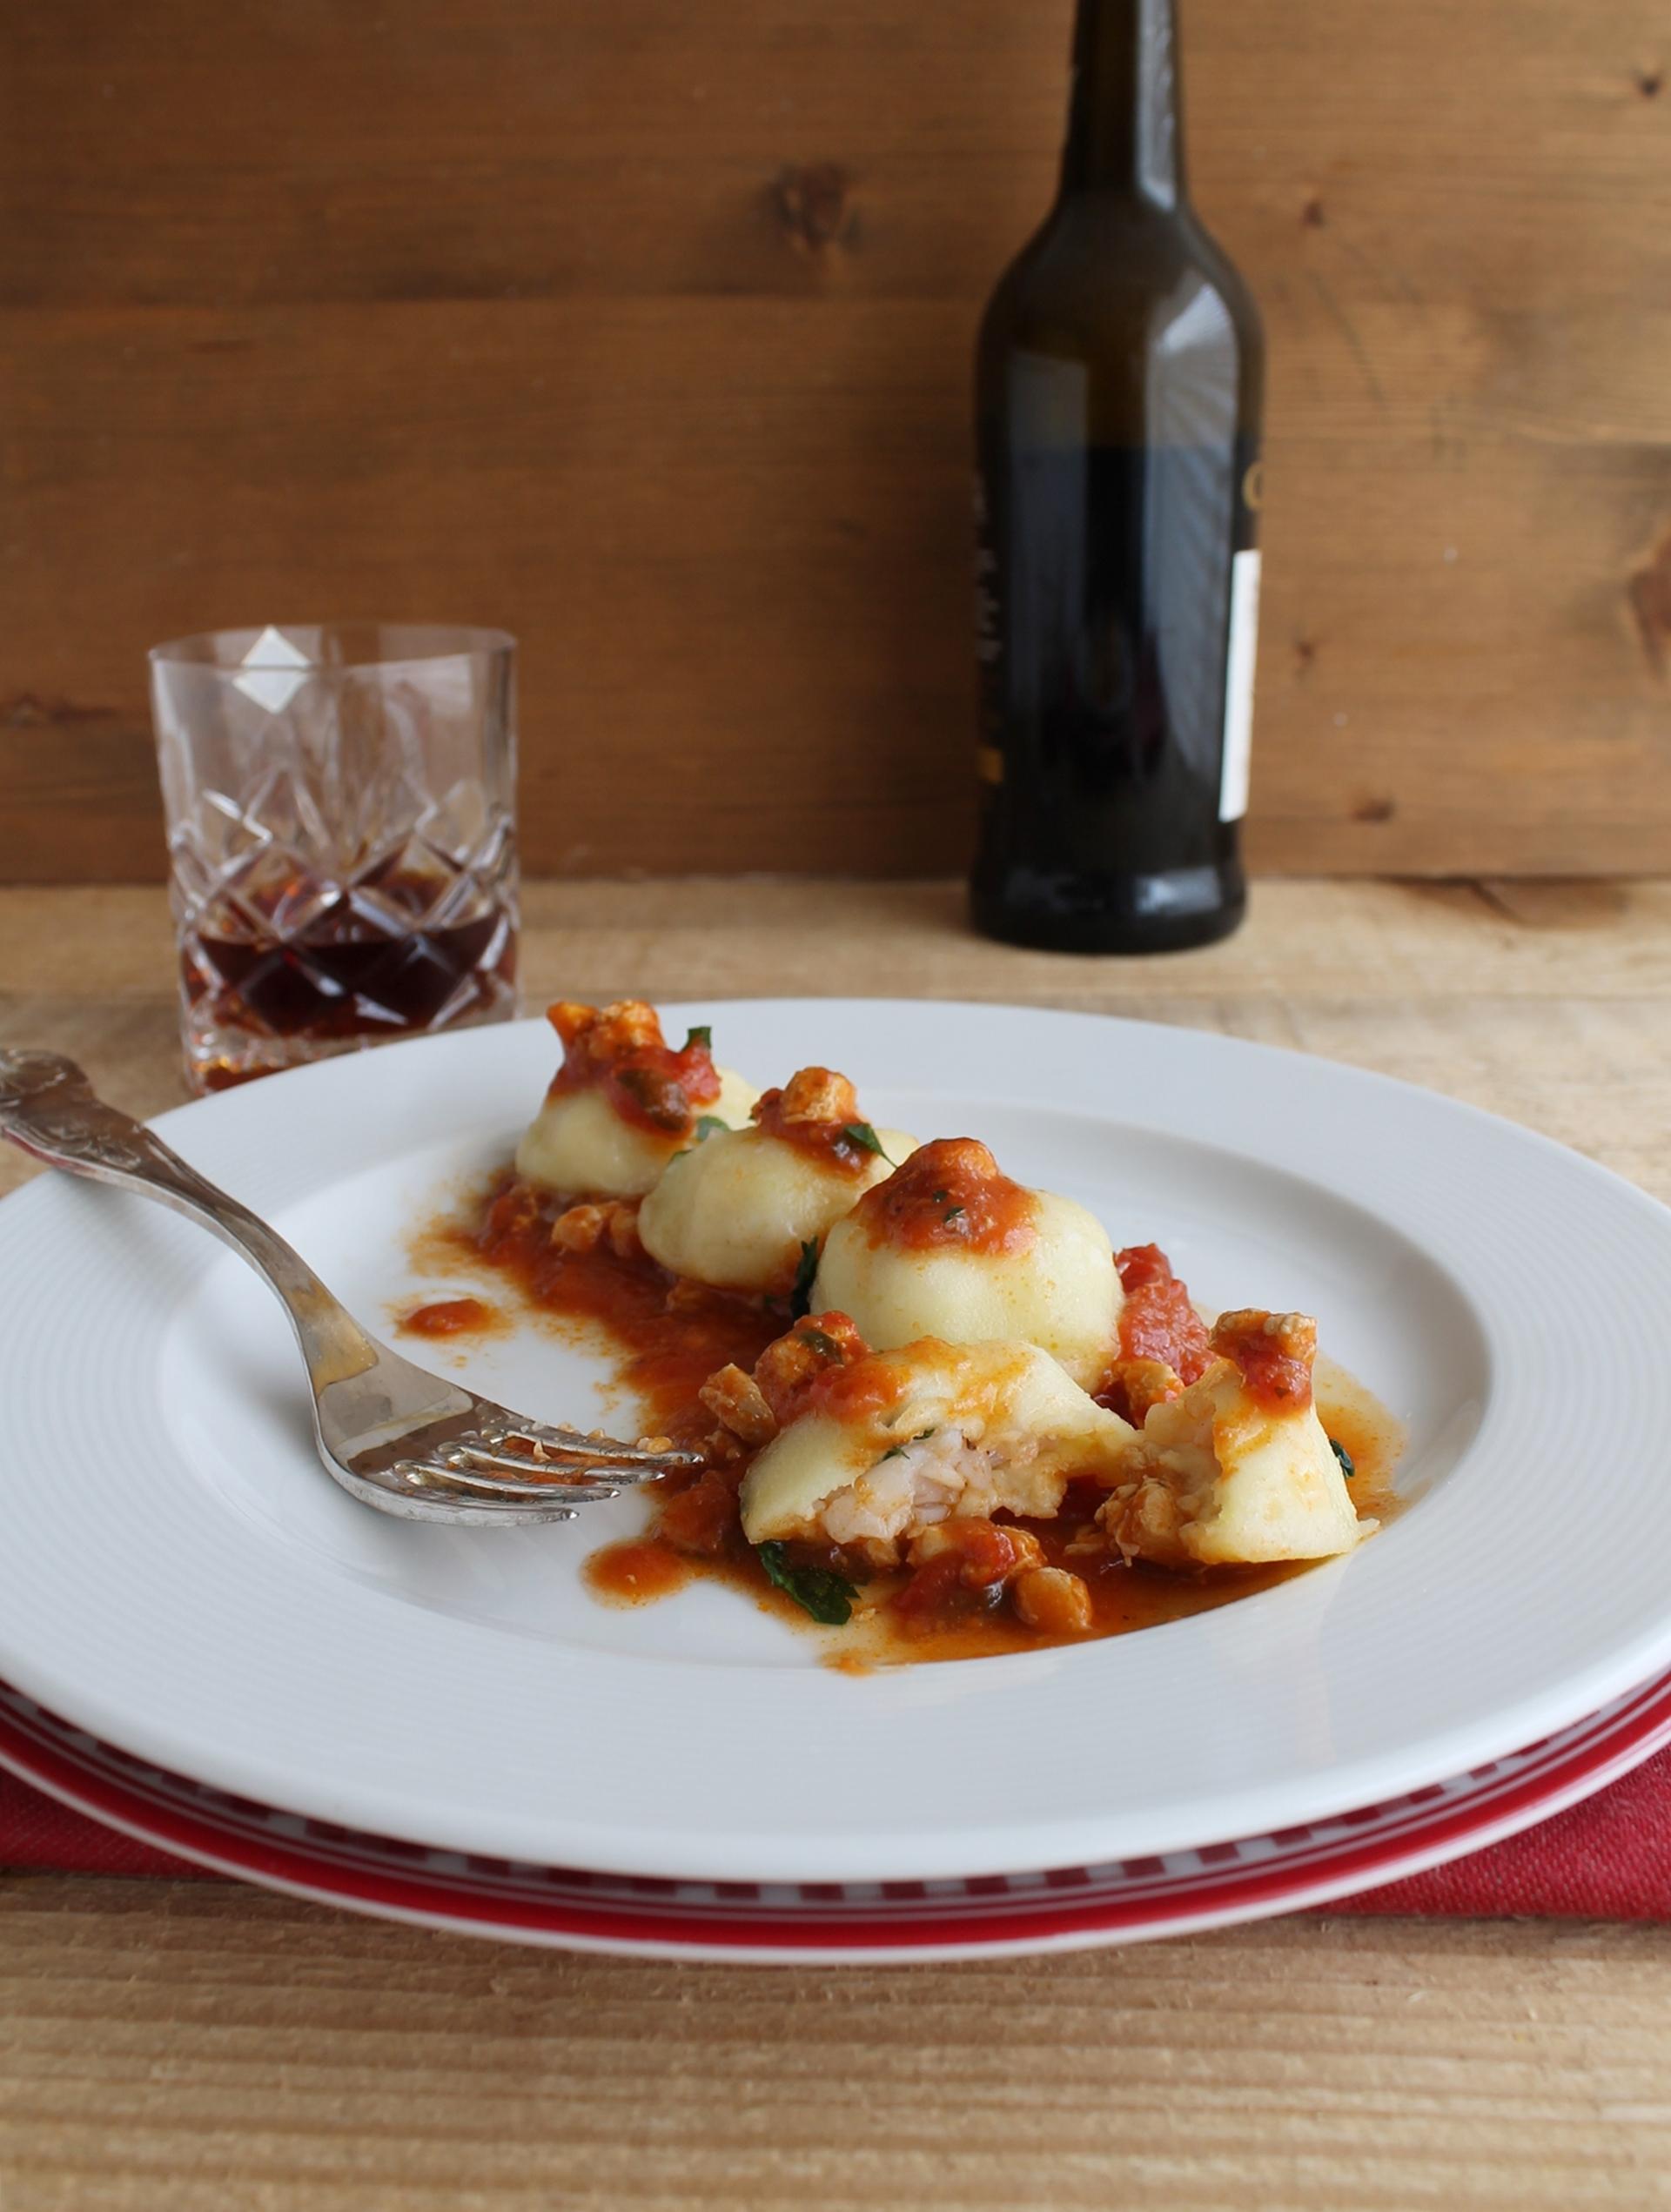 Ravioli di patate con ragù di pesce - La Cassata Celiaca